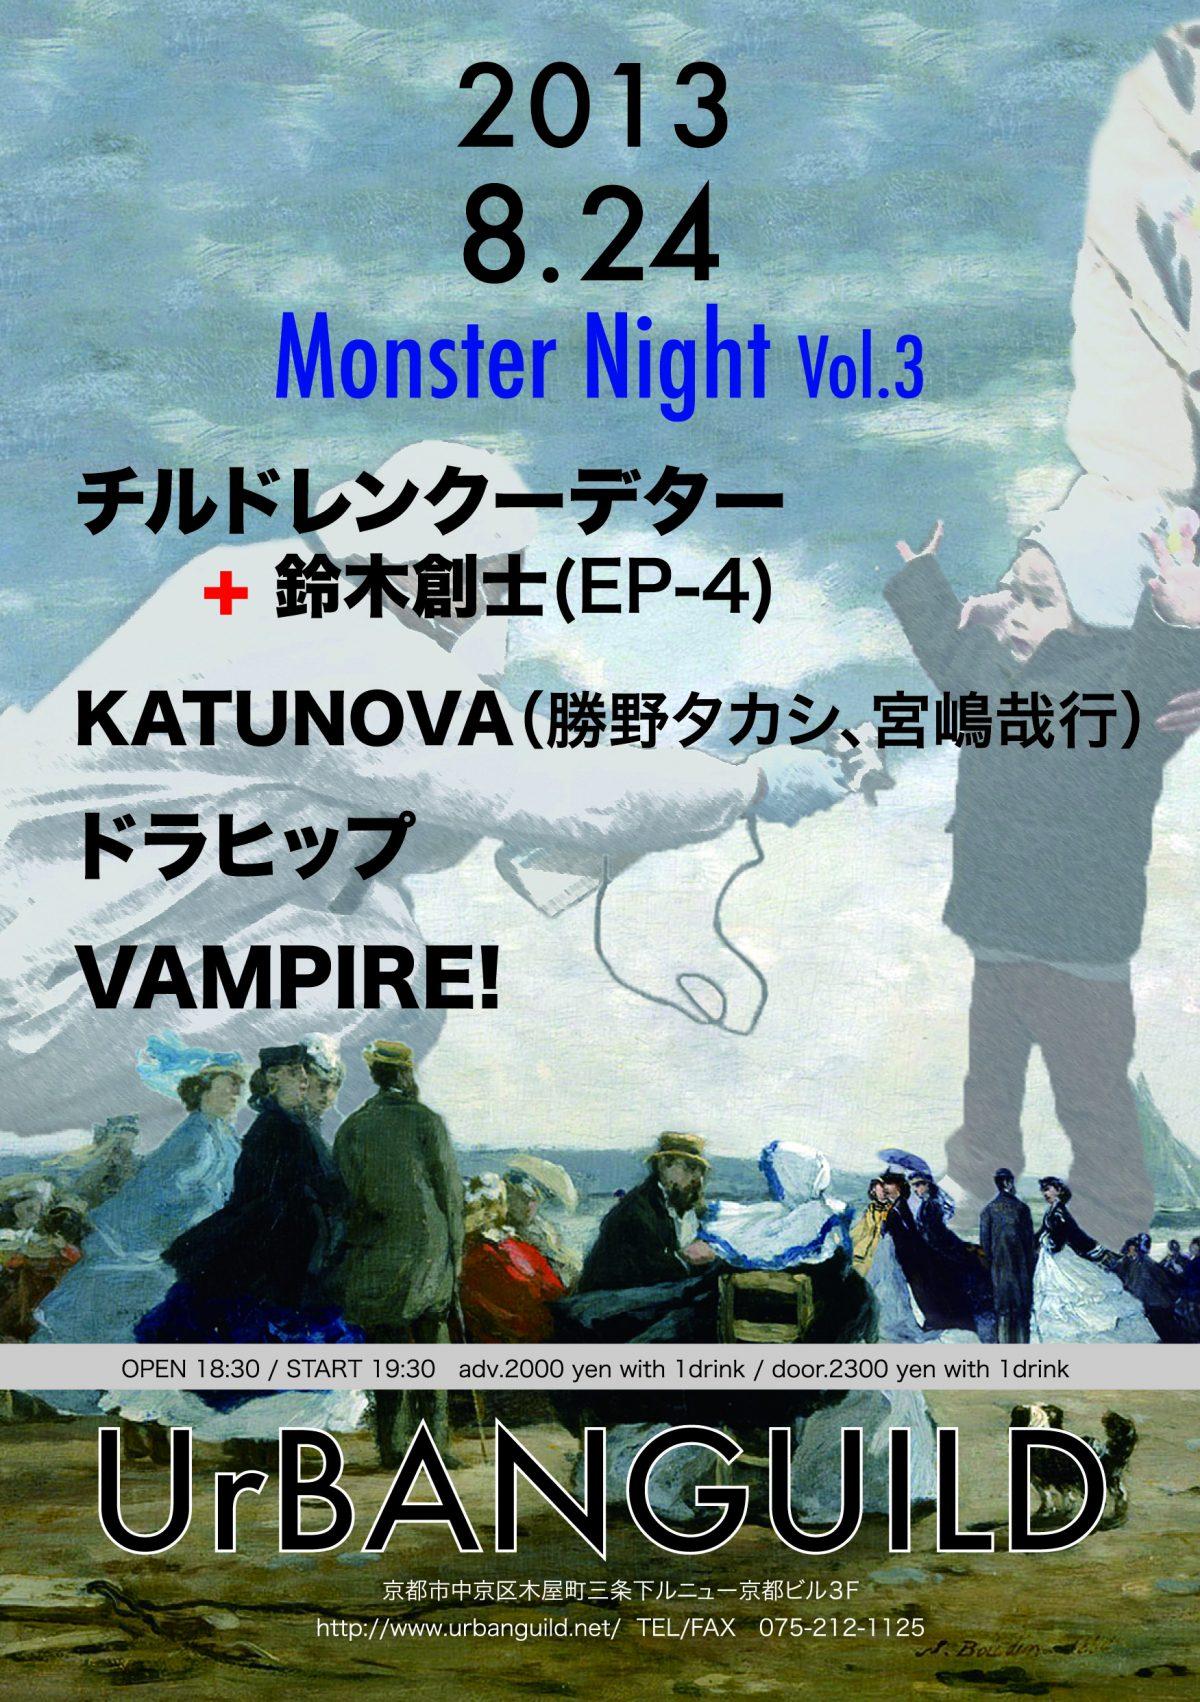 2013.8.24 flyer